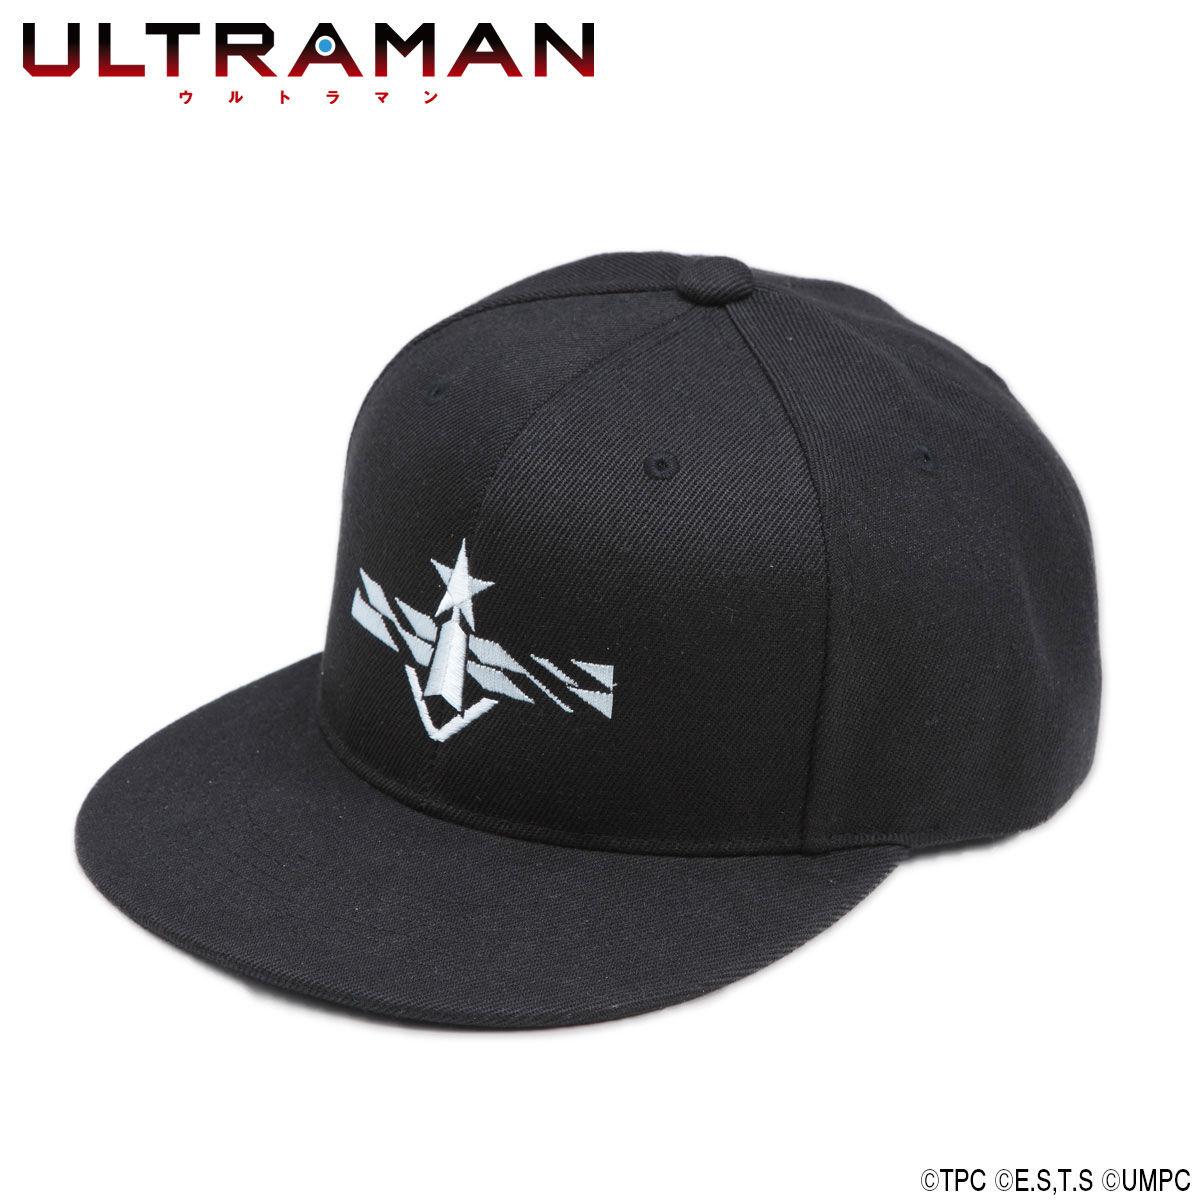 Animation Ultraman Cap (SSSP mark)